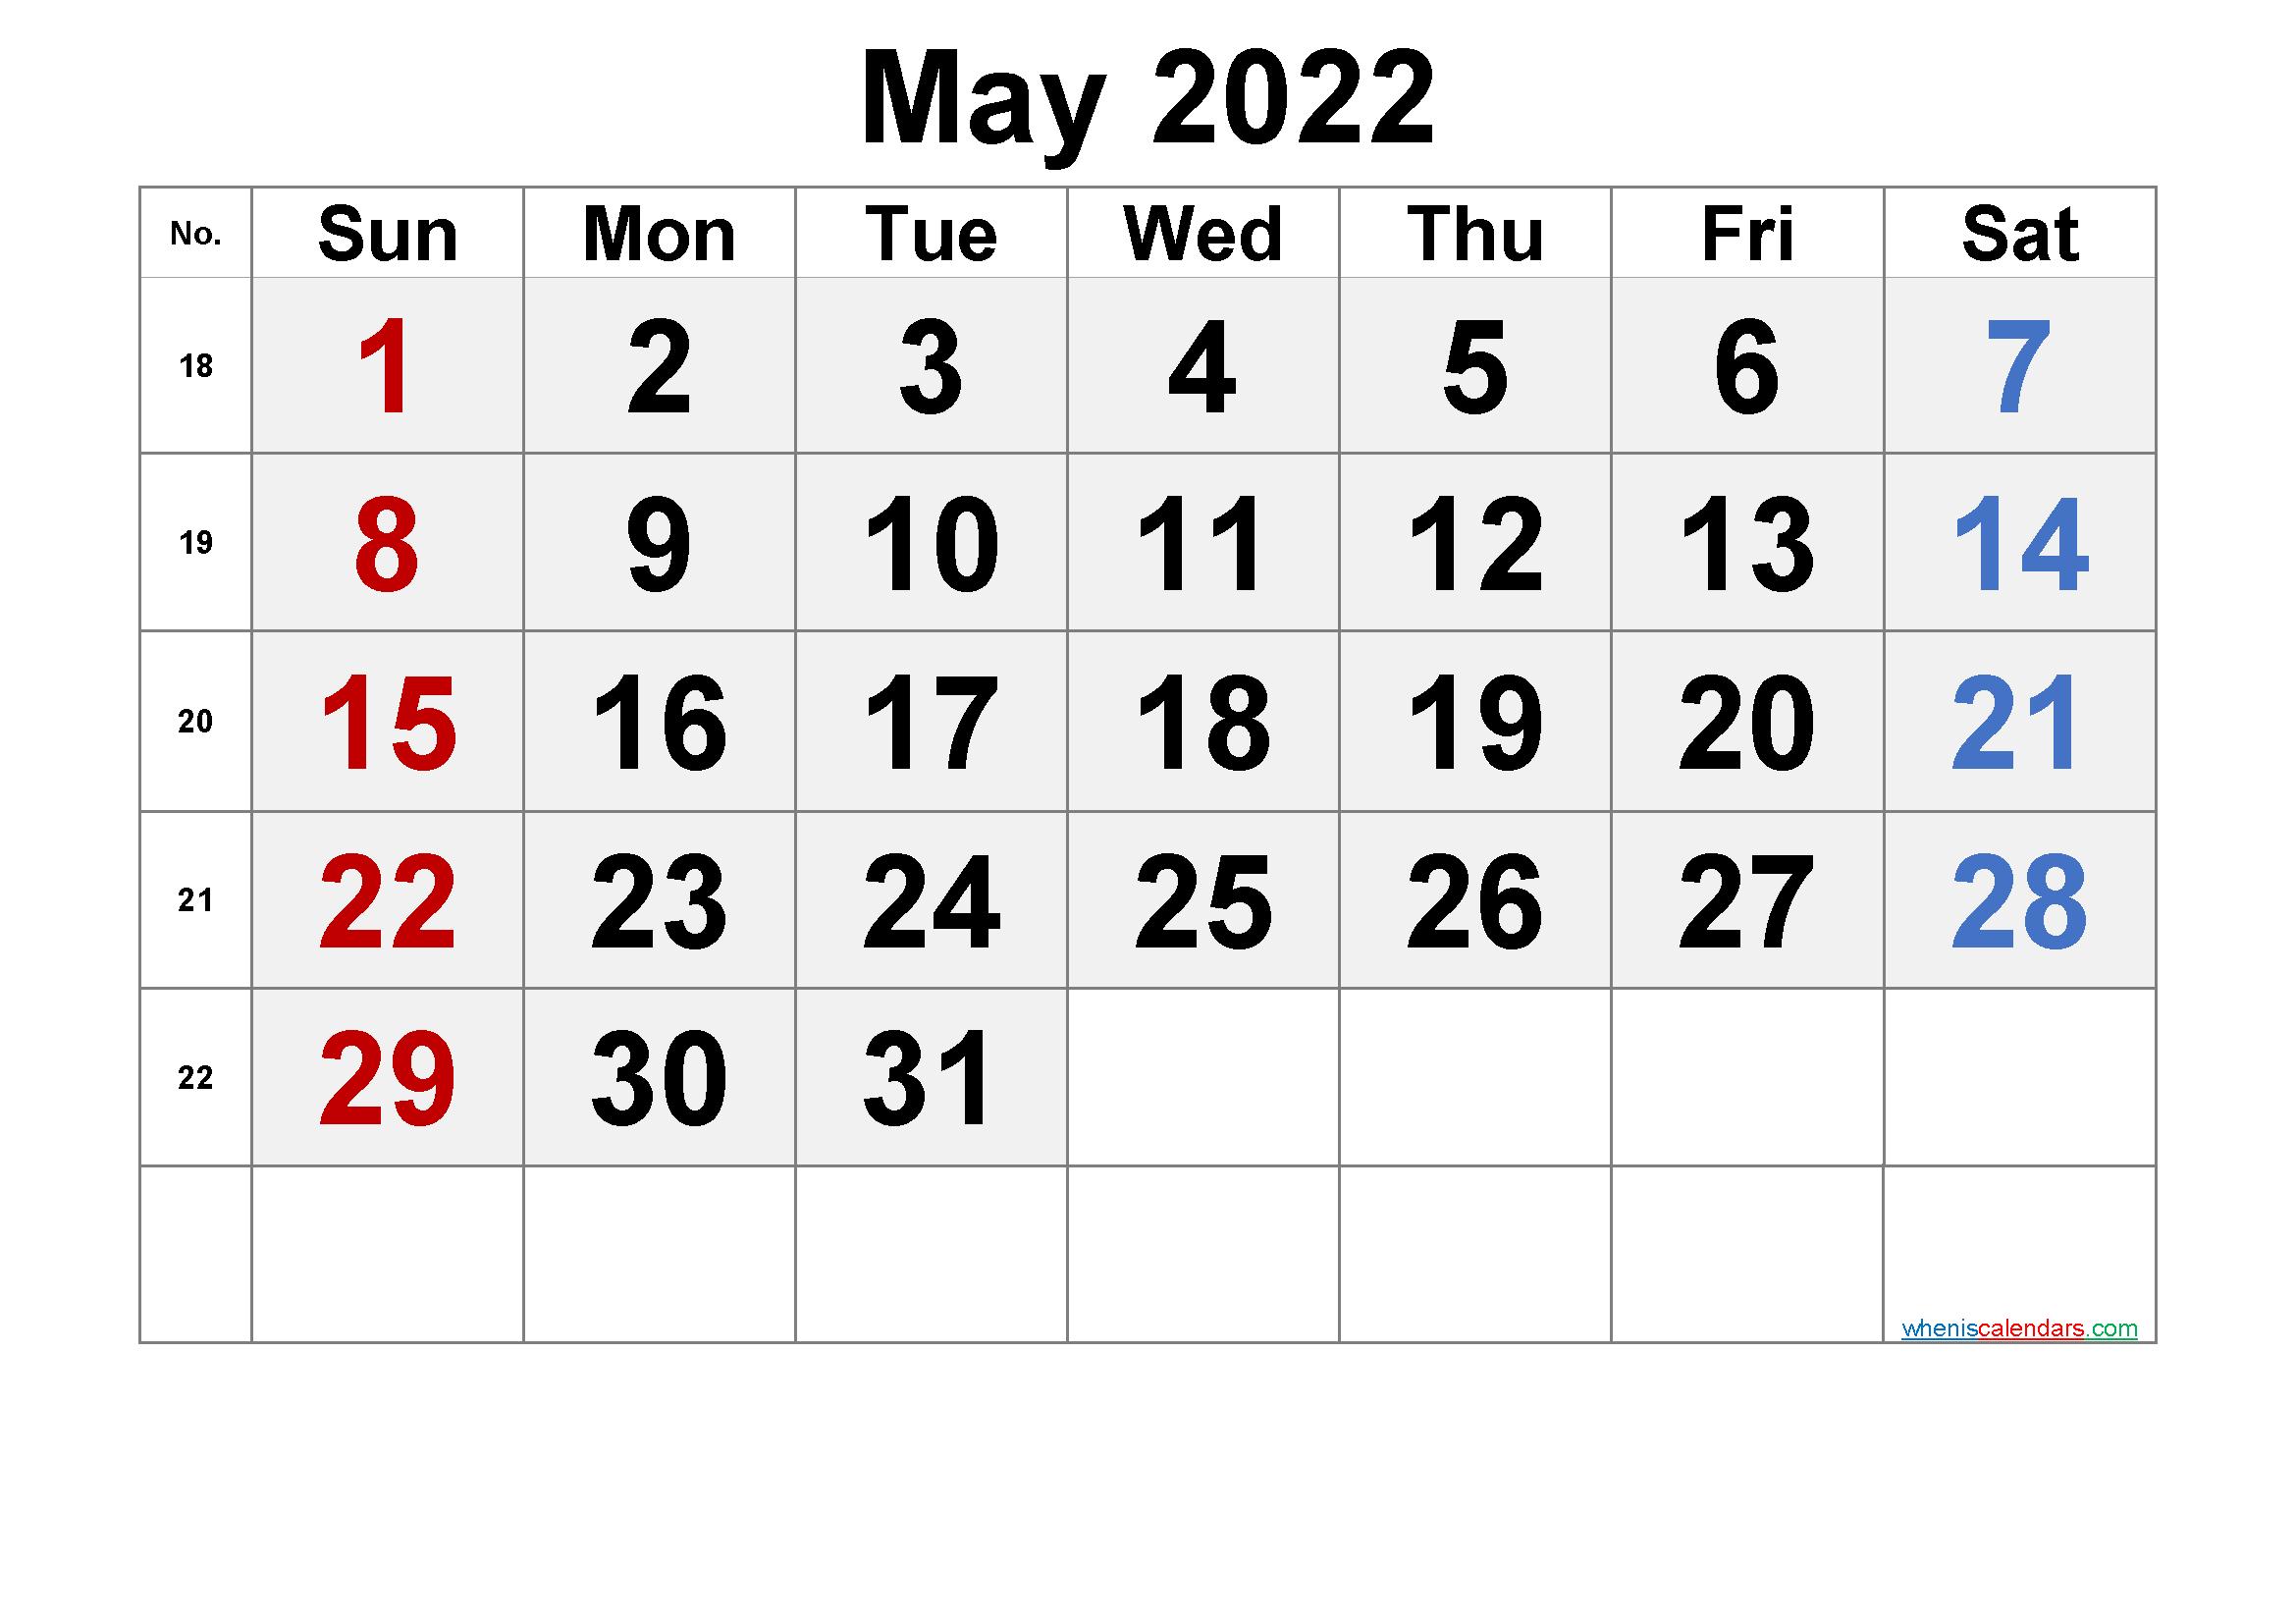 Printable Calendar May 2022 - 6 Templates - Free Printable with regard to Printable Calendar May 2022